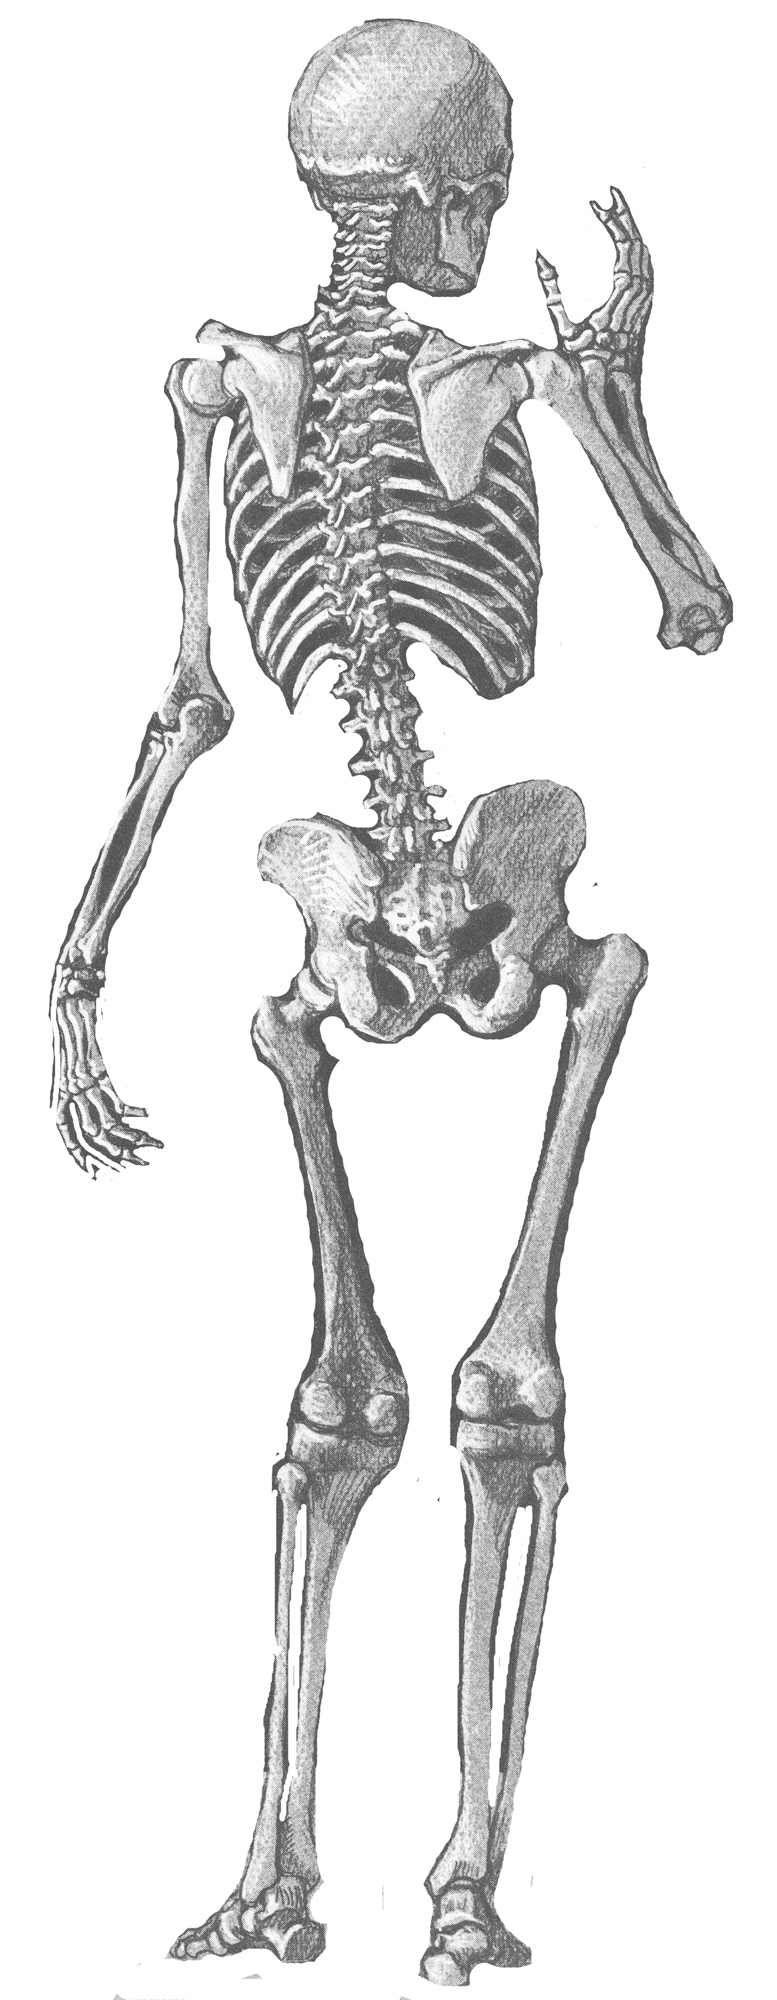 Pin de Rebeca Armendariz en Fisio | Pinterest | Anatomía, Calaveras ...